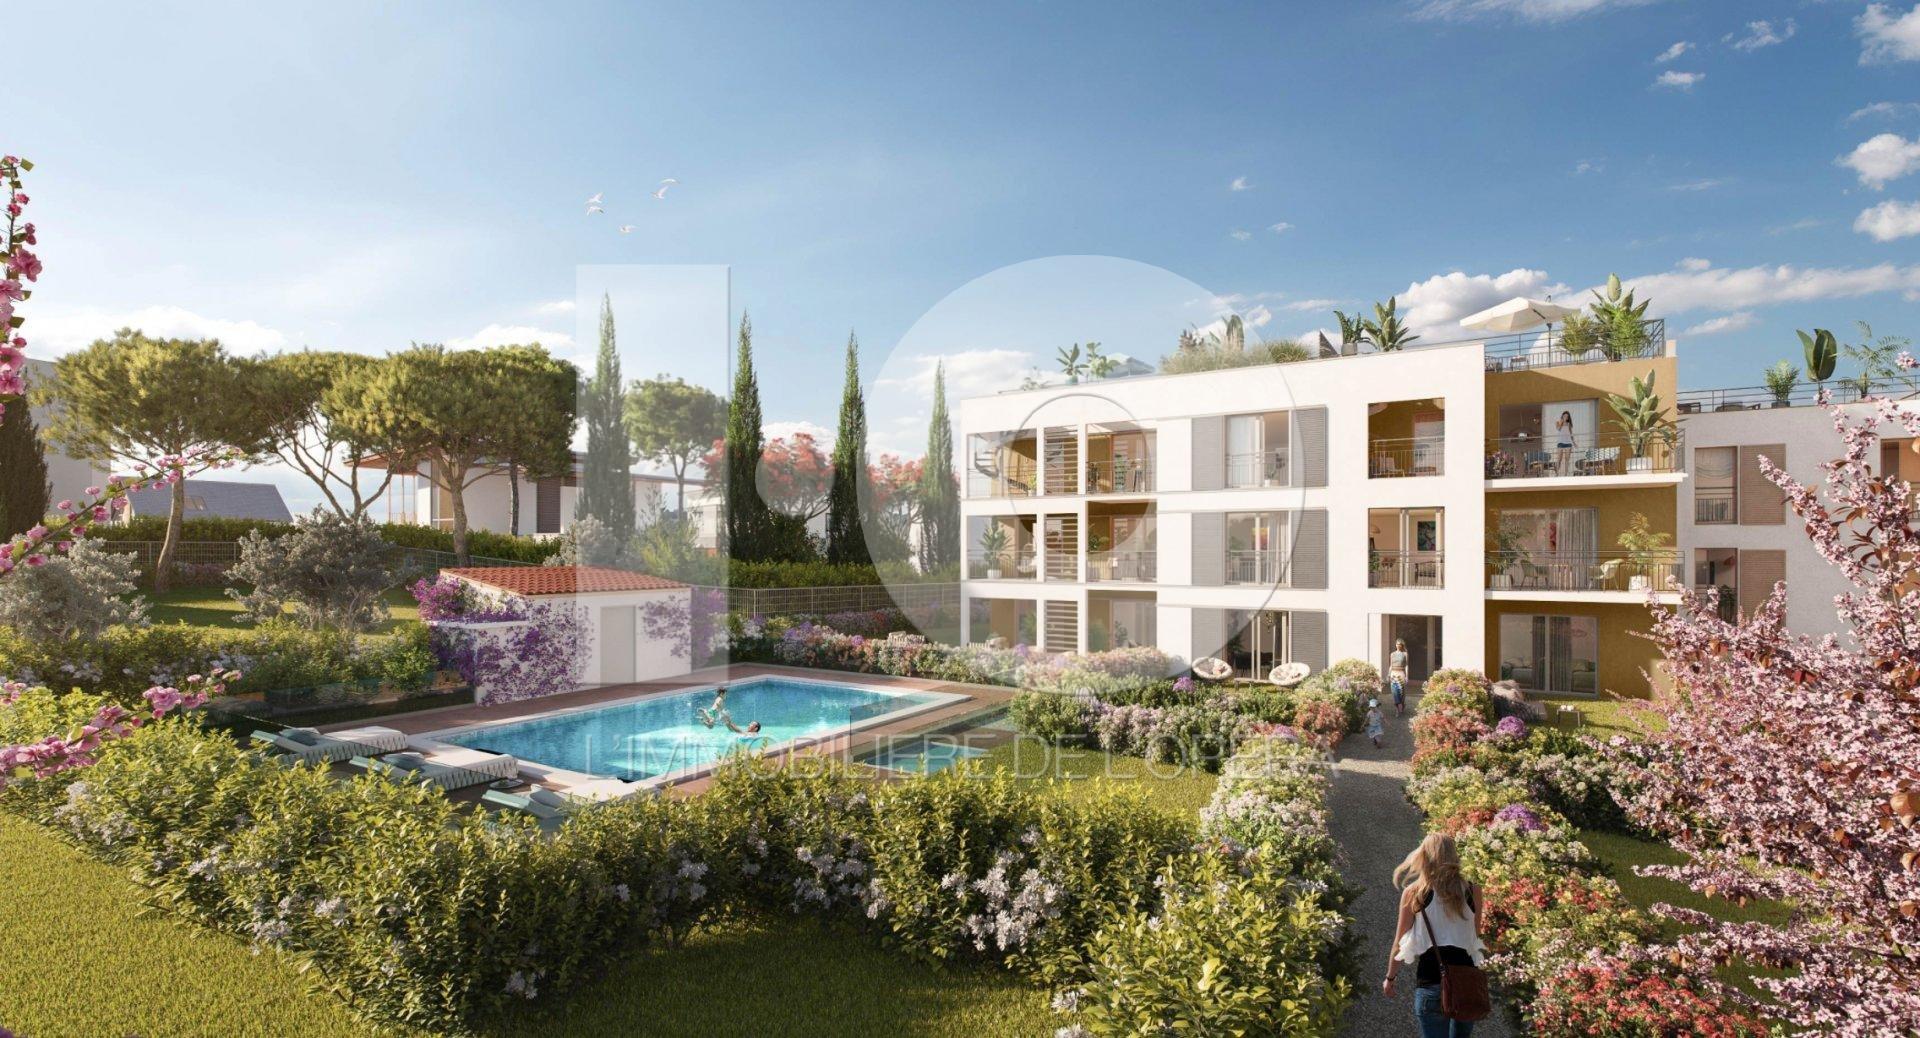 06600 ANTIBES - Appartement de 4 pièces en rez de jardin